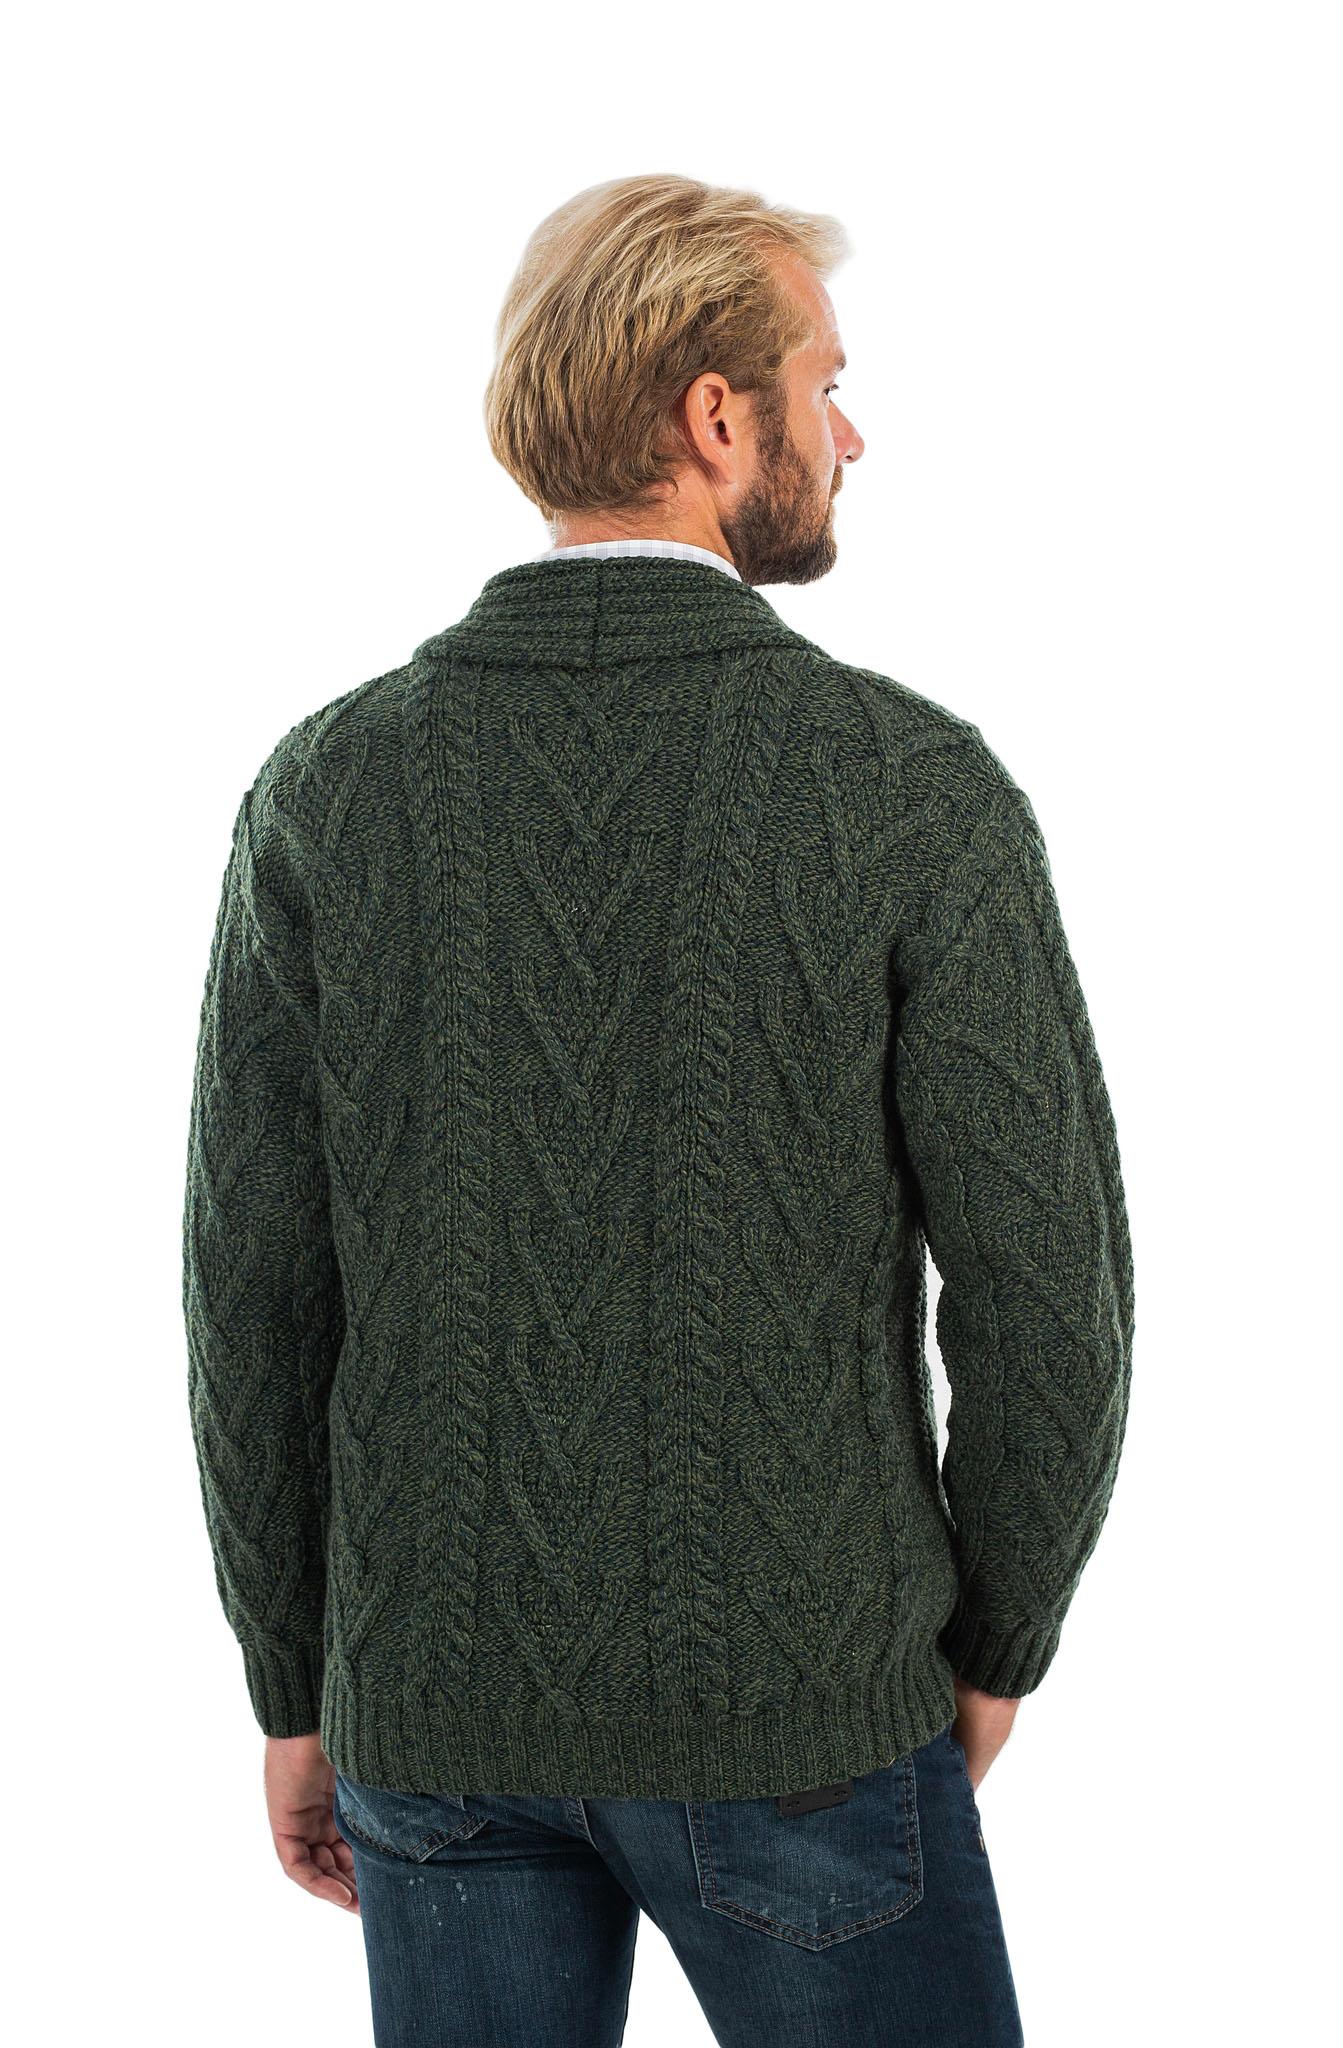 SAOL-Mens-Irish-Merino-Wool-Cardigan-Shawl-Collar-Front-Pockets-Aran-Cable-Knit thumbnail 5